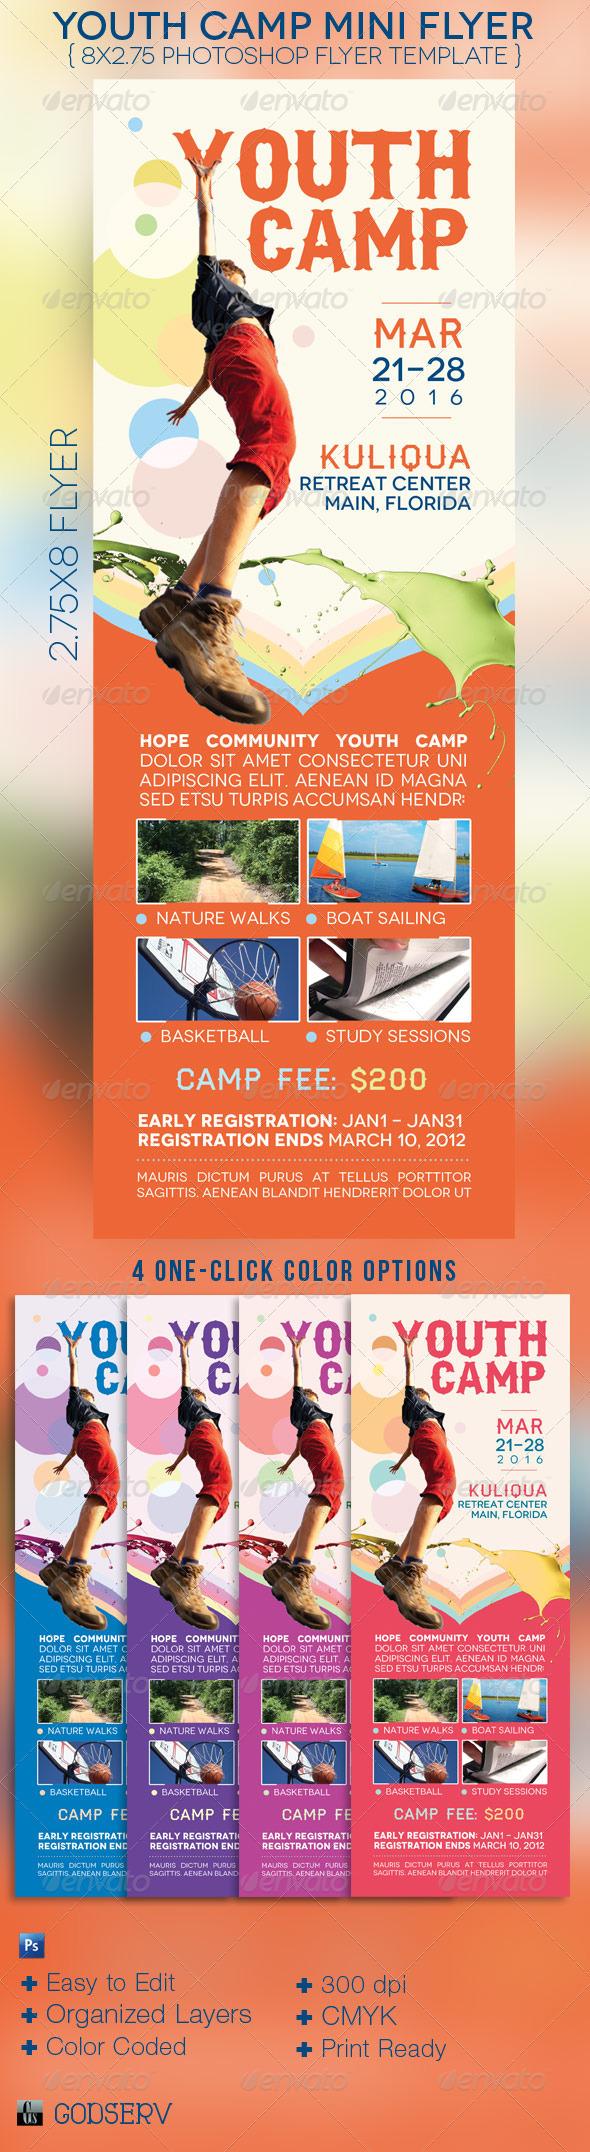 Free printable youth flyer templates blaspiconthejunkexpress free printable youth flyer templates stopboris Gallery